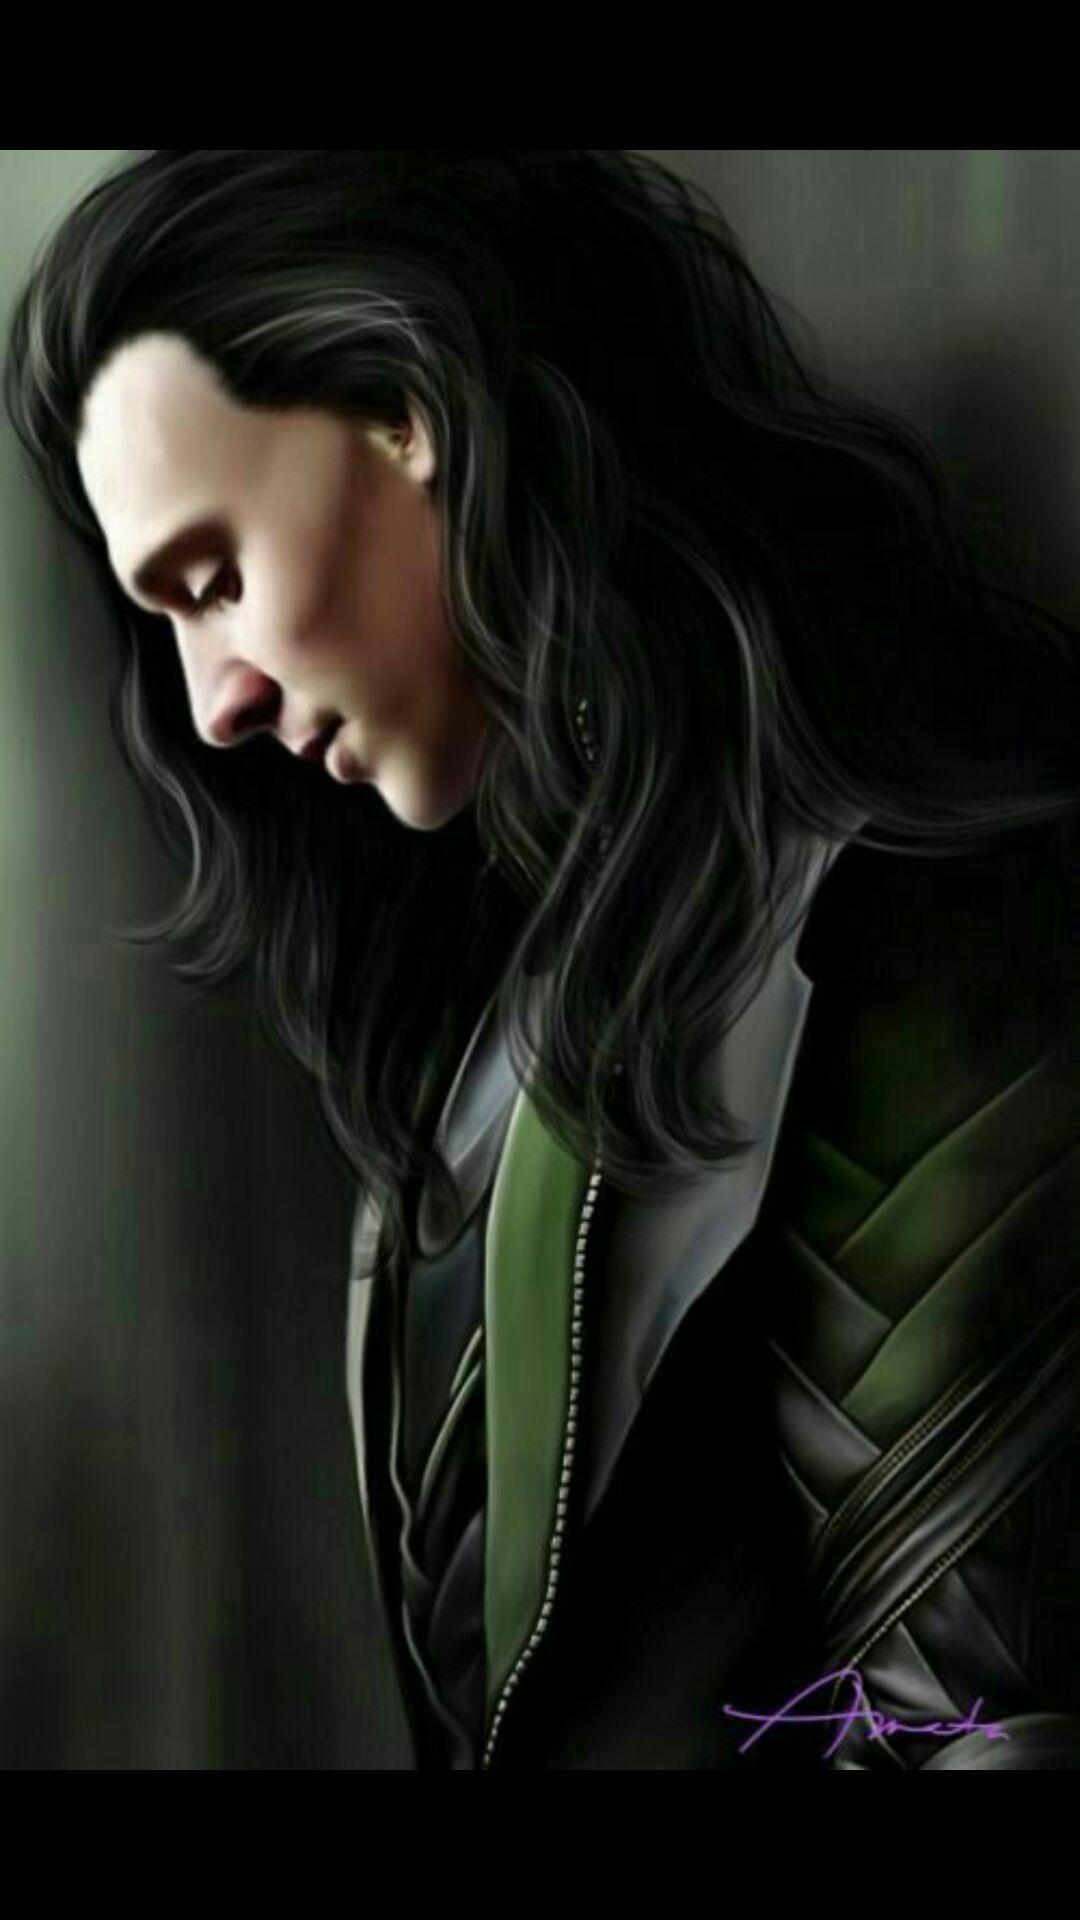 Tom Hiddleston One Shots - King of my Heart (Loki) - Wattpad